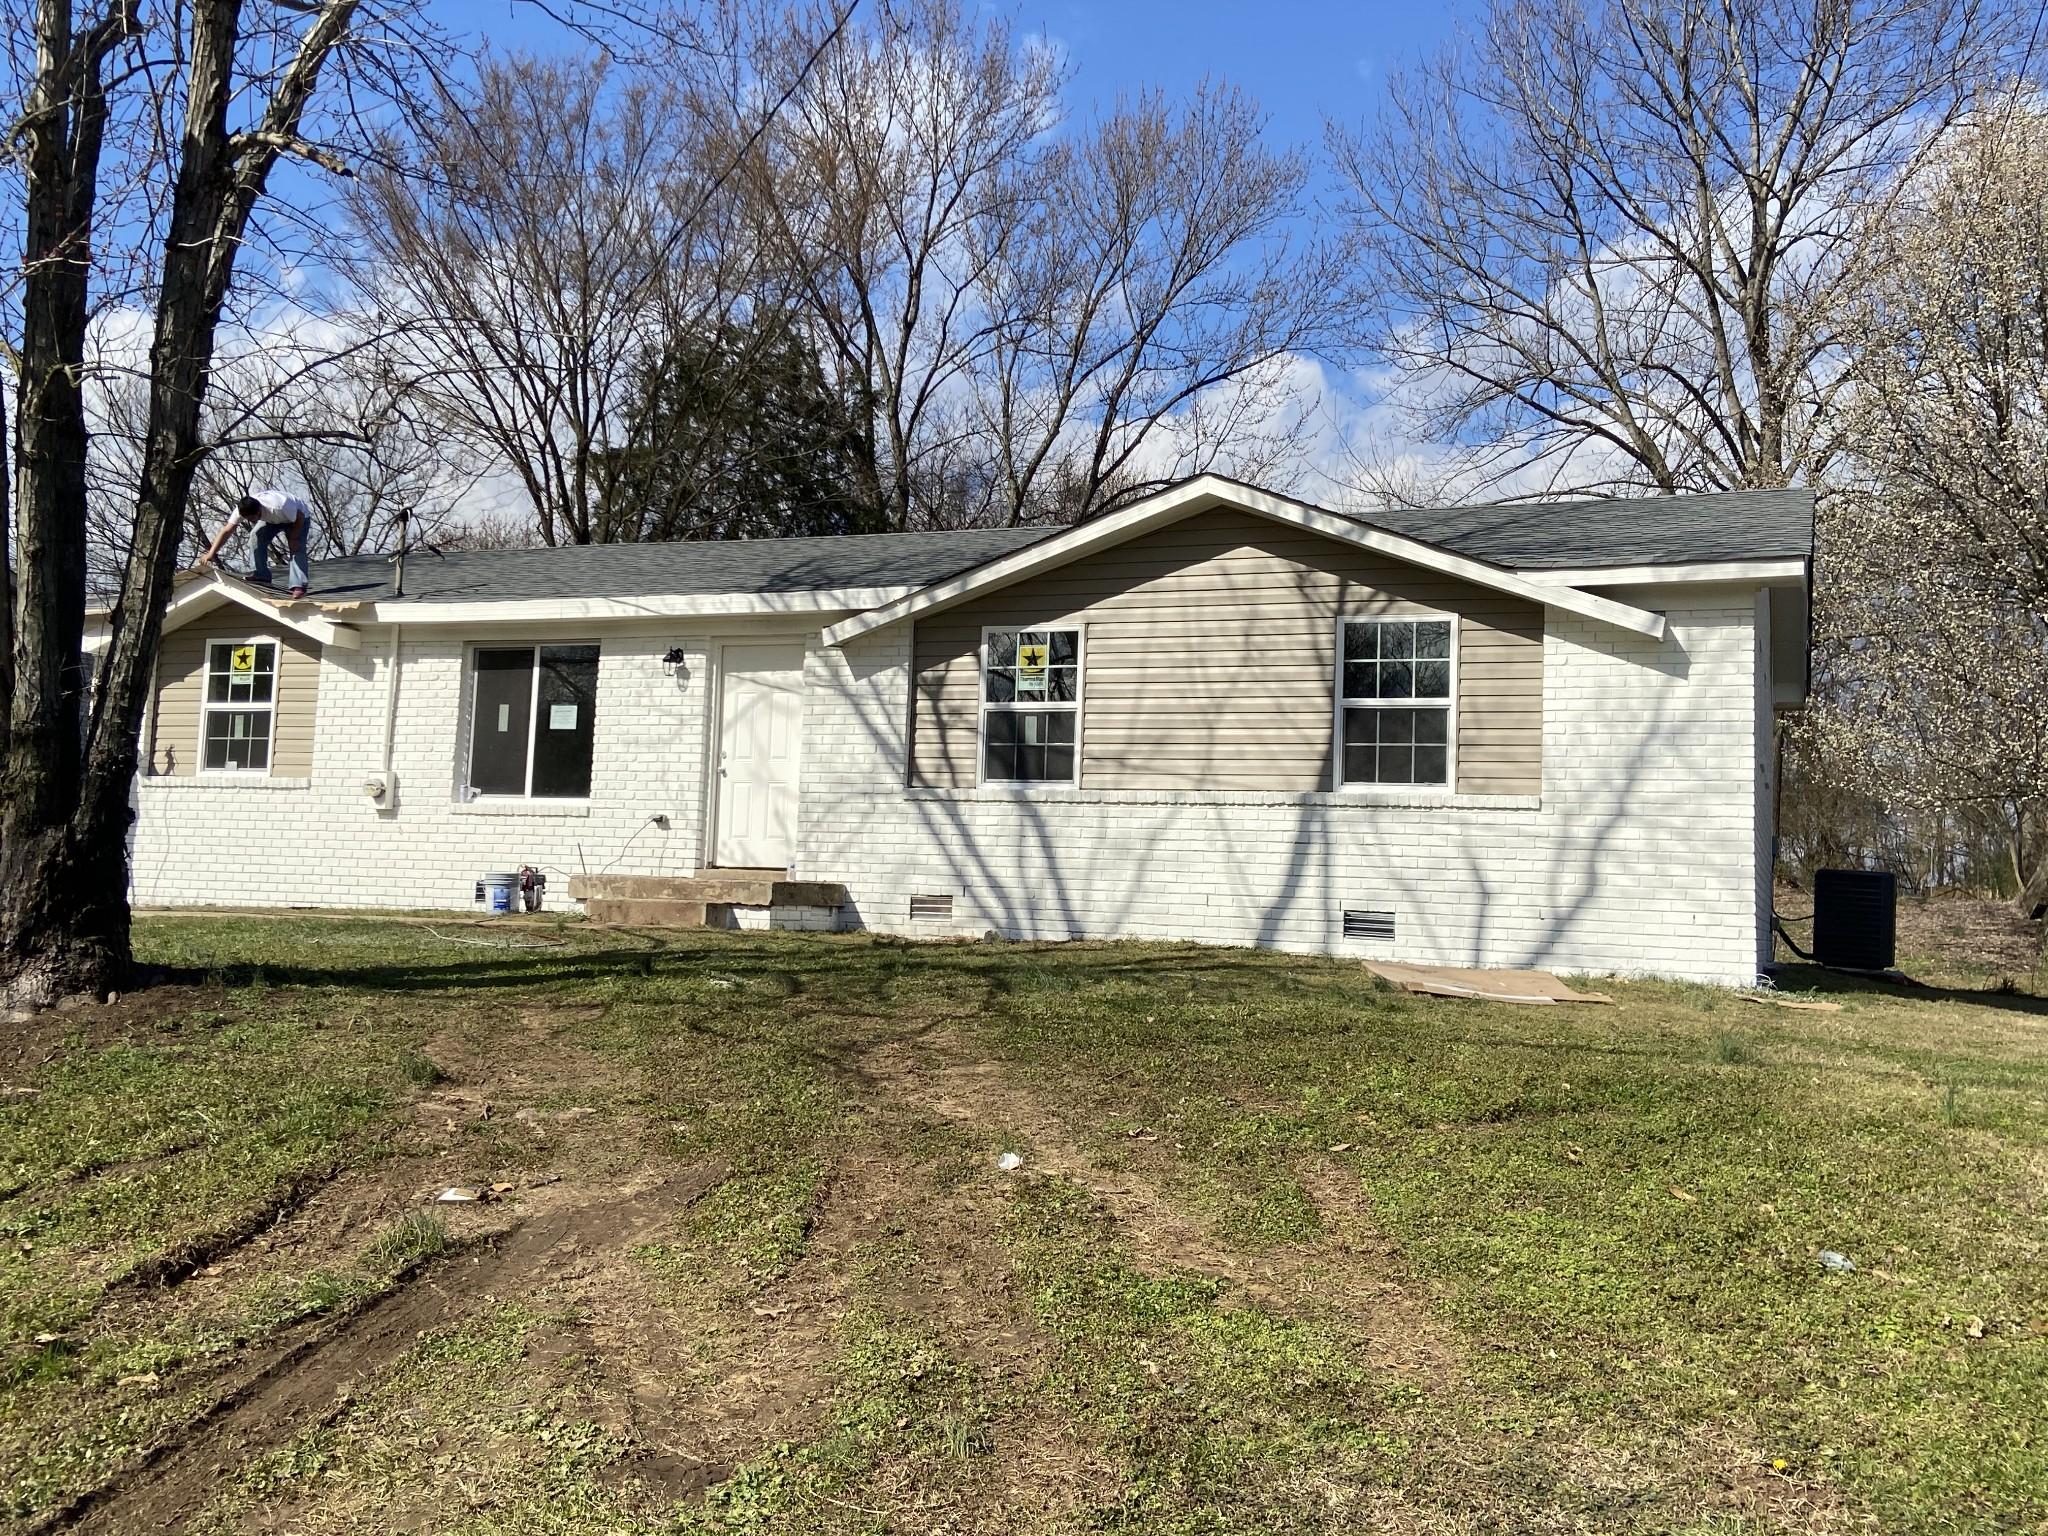 4872 Shihmen Dr, Antioch, TN 37013 - Antioch, TN real estate listing